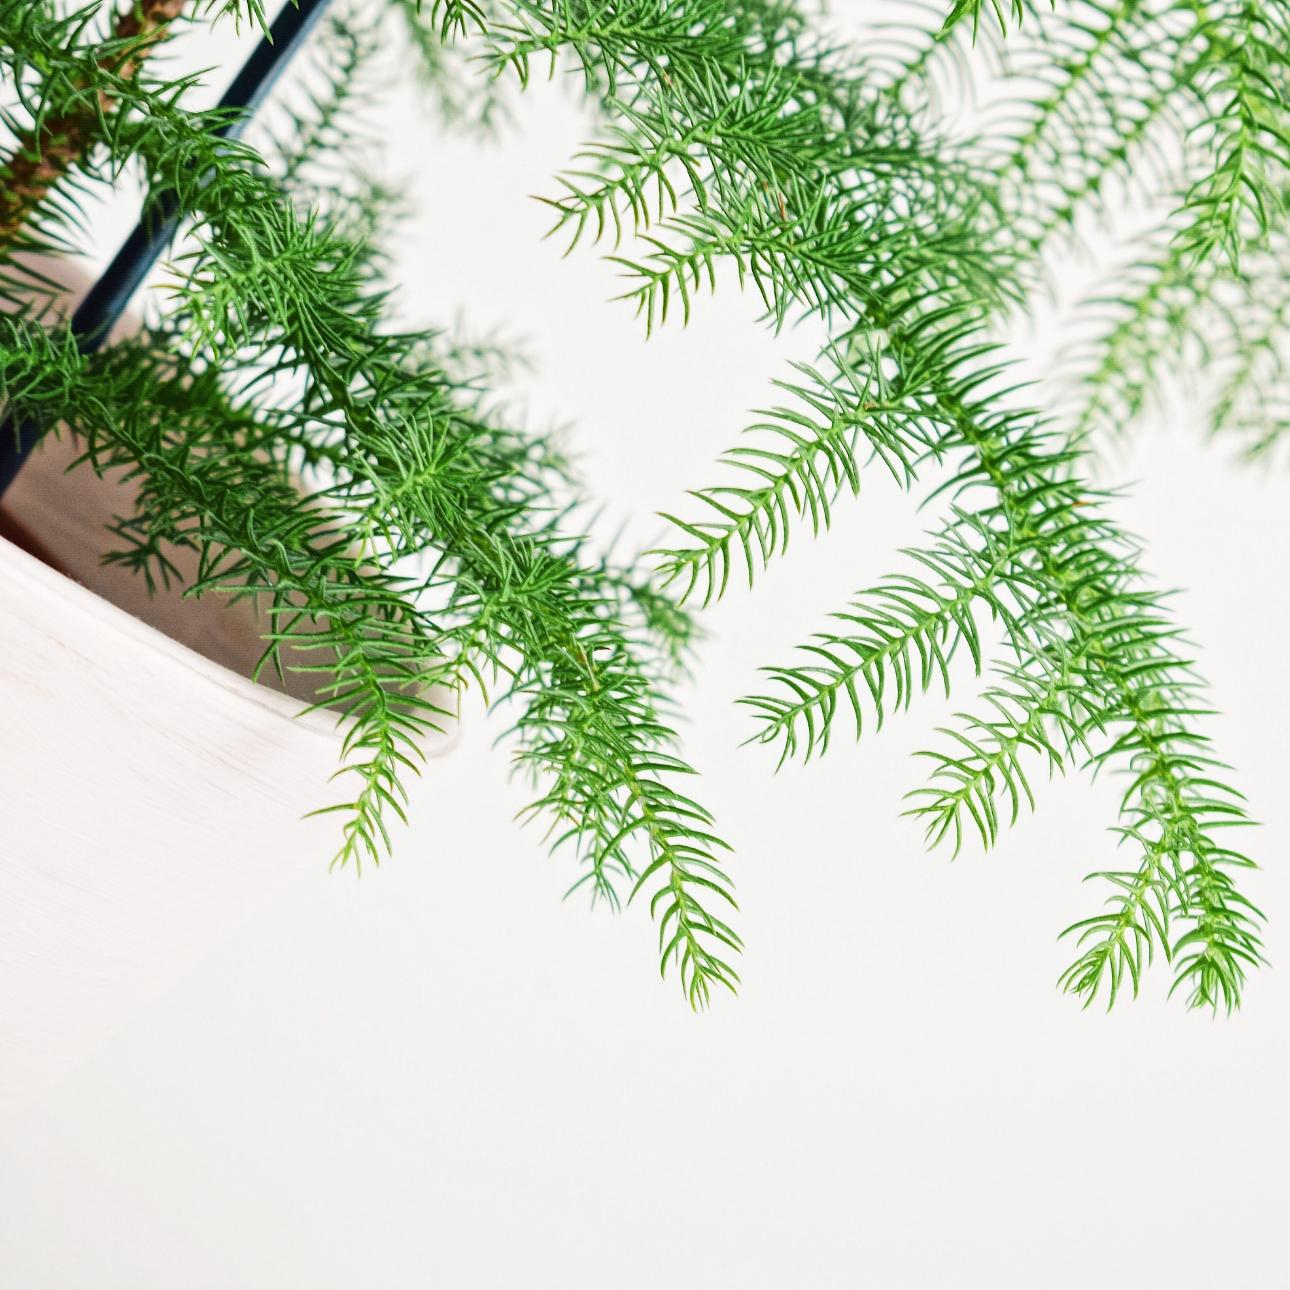 kamerden mini kerstboom kamerplant